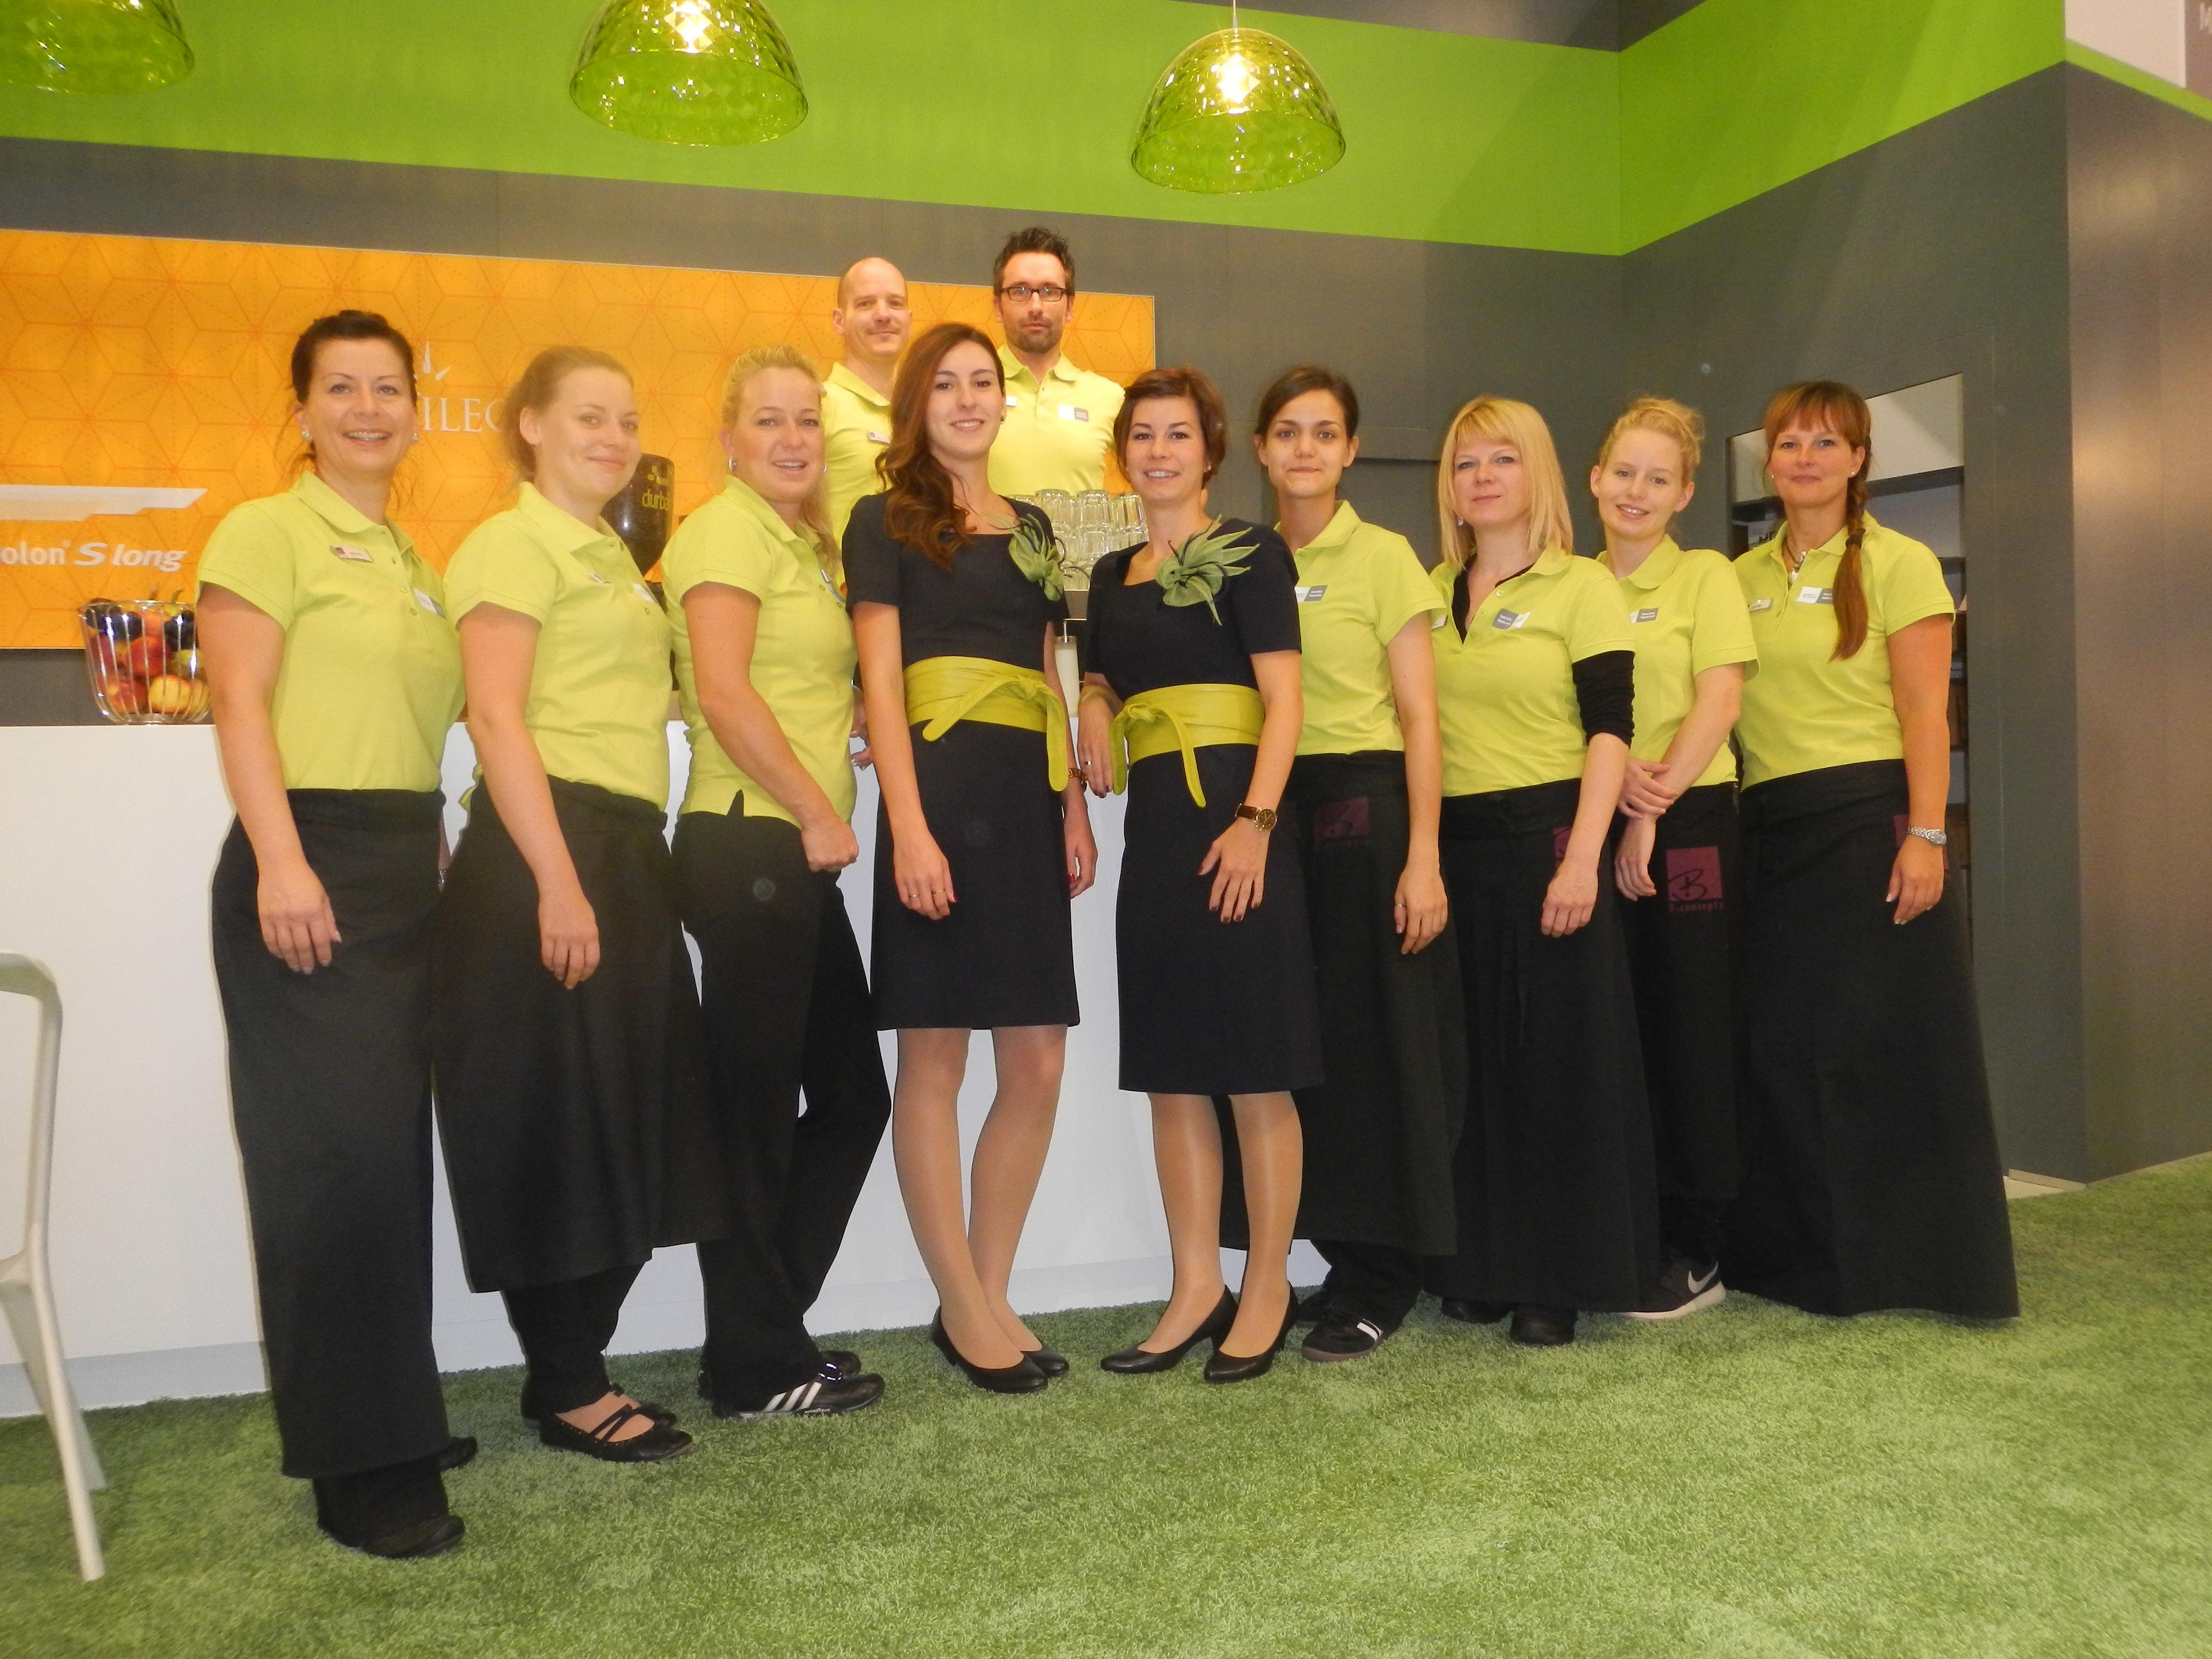 Team DGN 2013